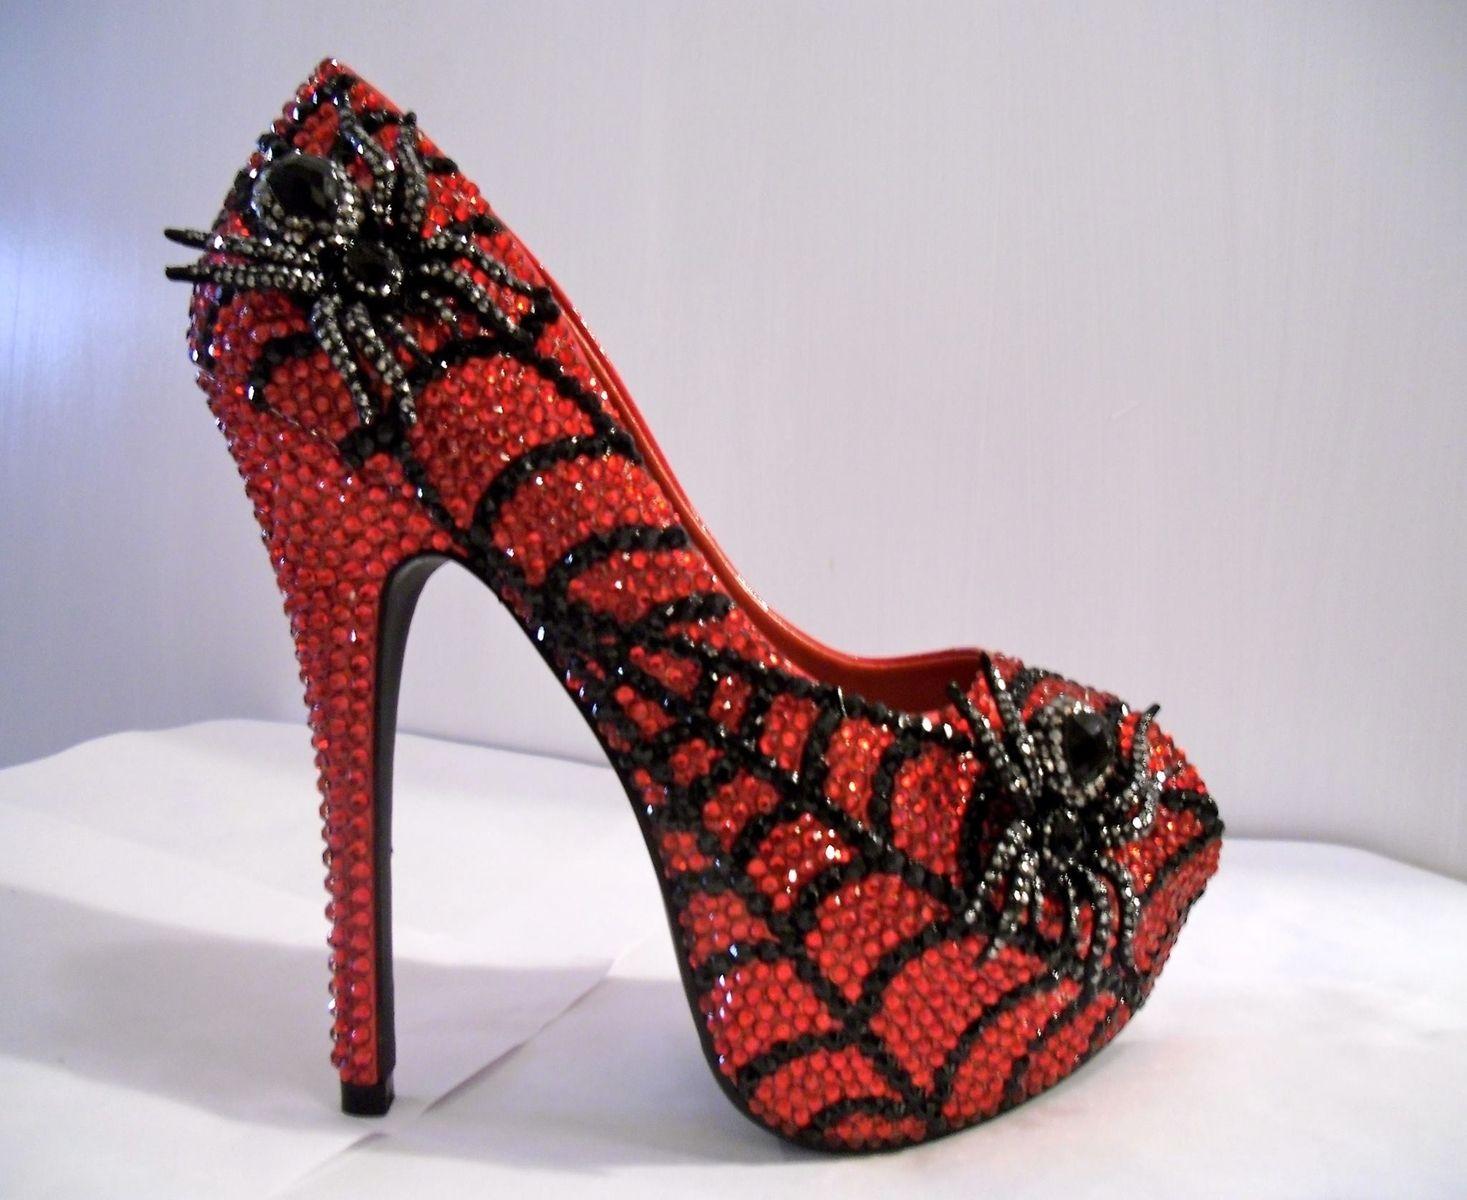 Buy A Custom Made Rhinestone Open Toe Spider Heels